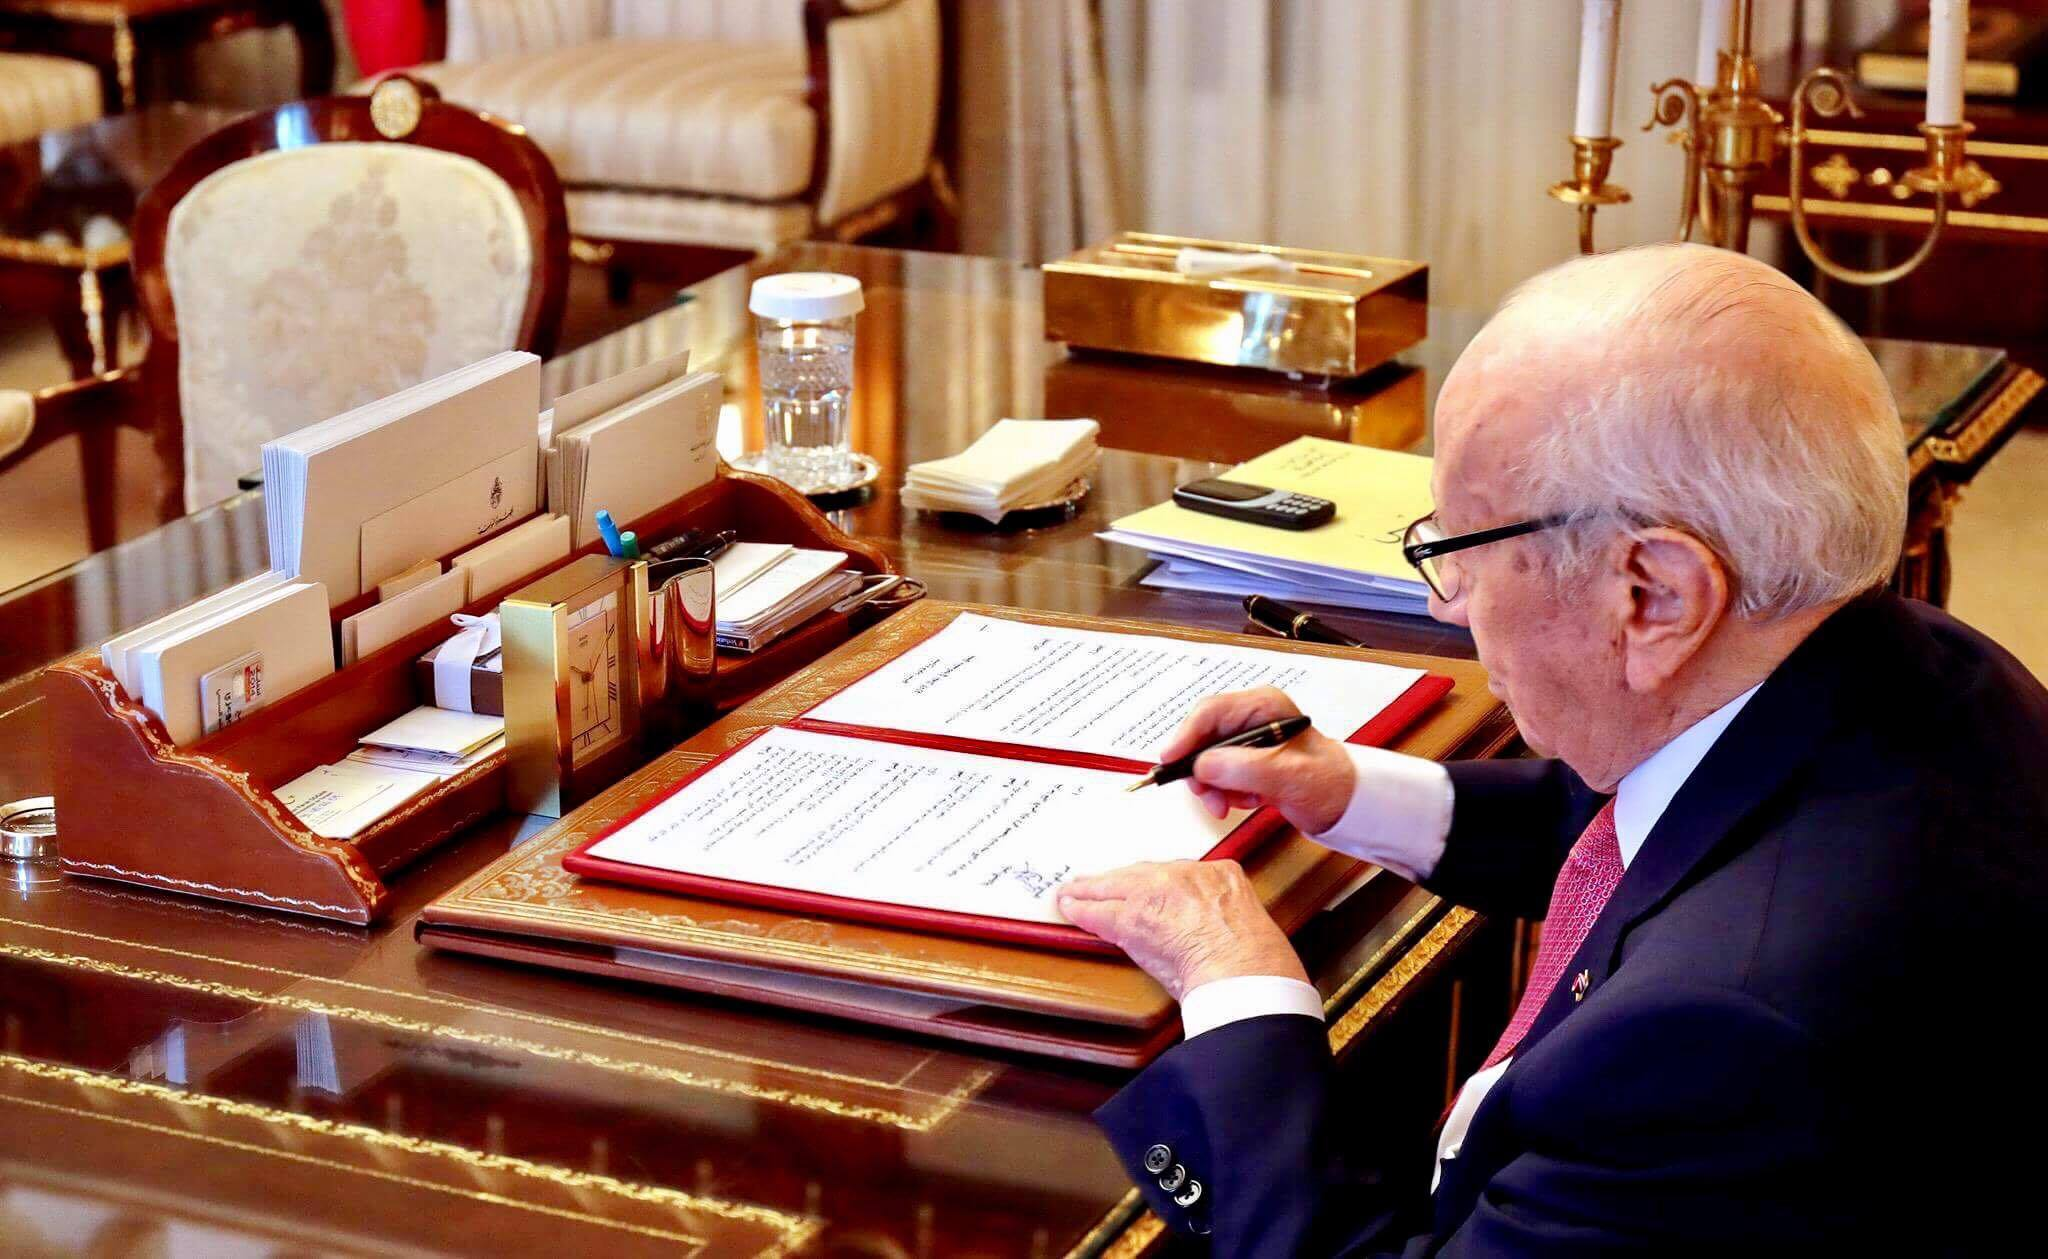 Tunisie: Béji Caïd Essebsi signe la loi de la réconciliation administrative